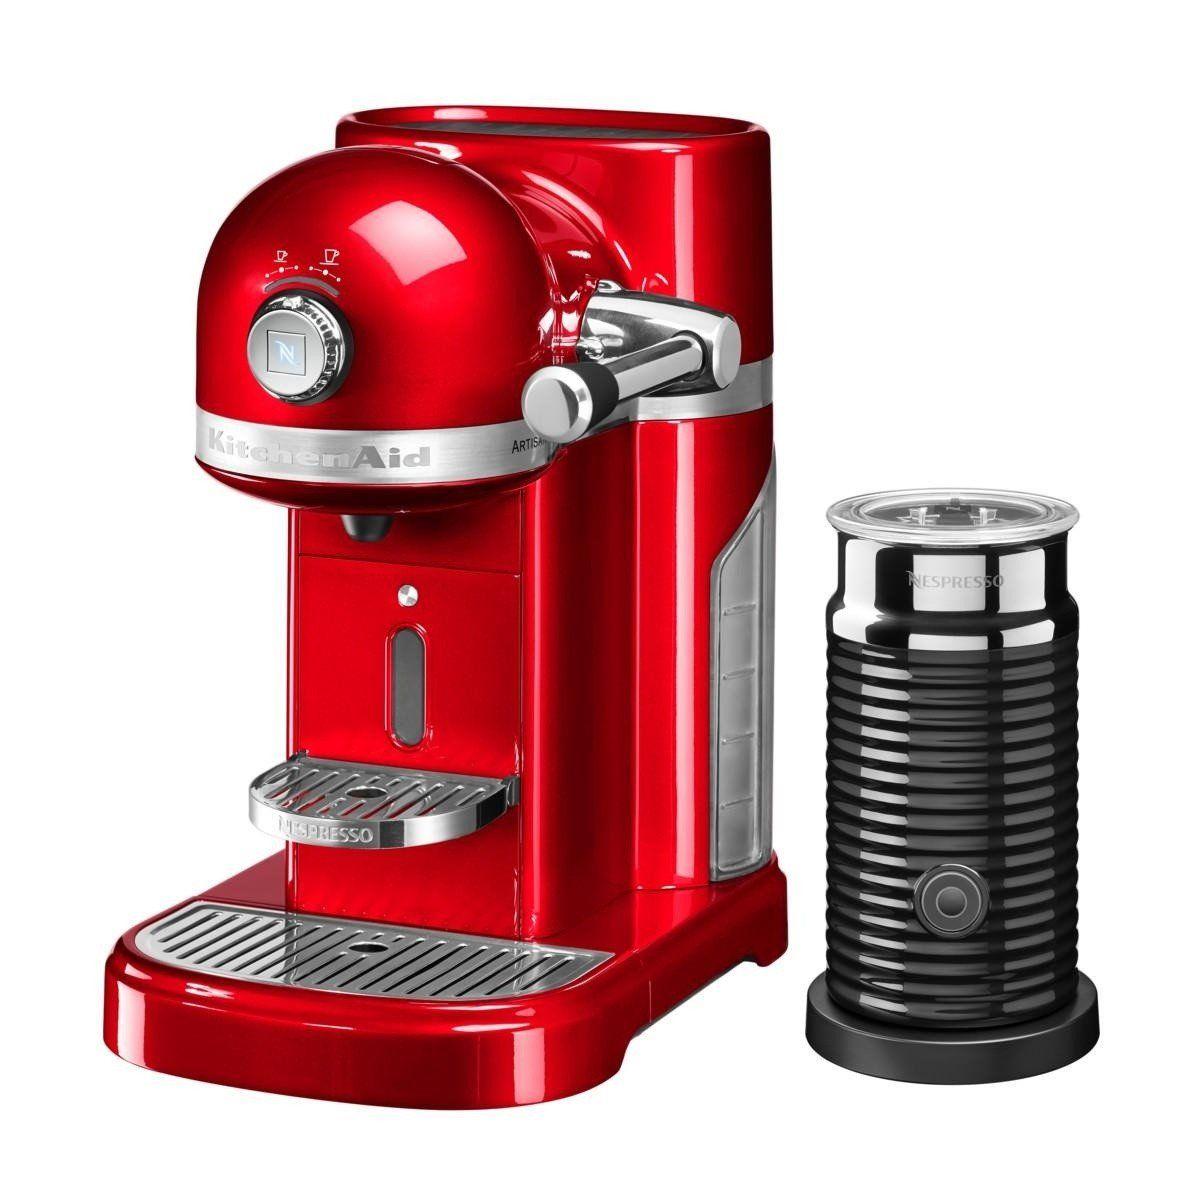 Artisan 5KES0504 Nespressomaschine+ Aeroccino | KitchenAid ...